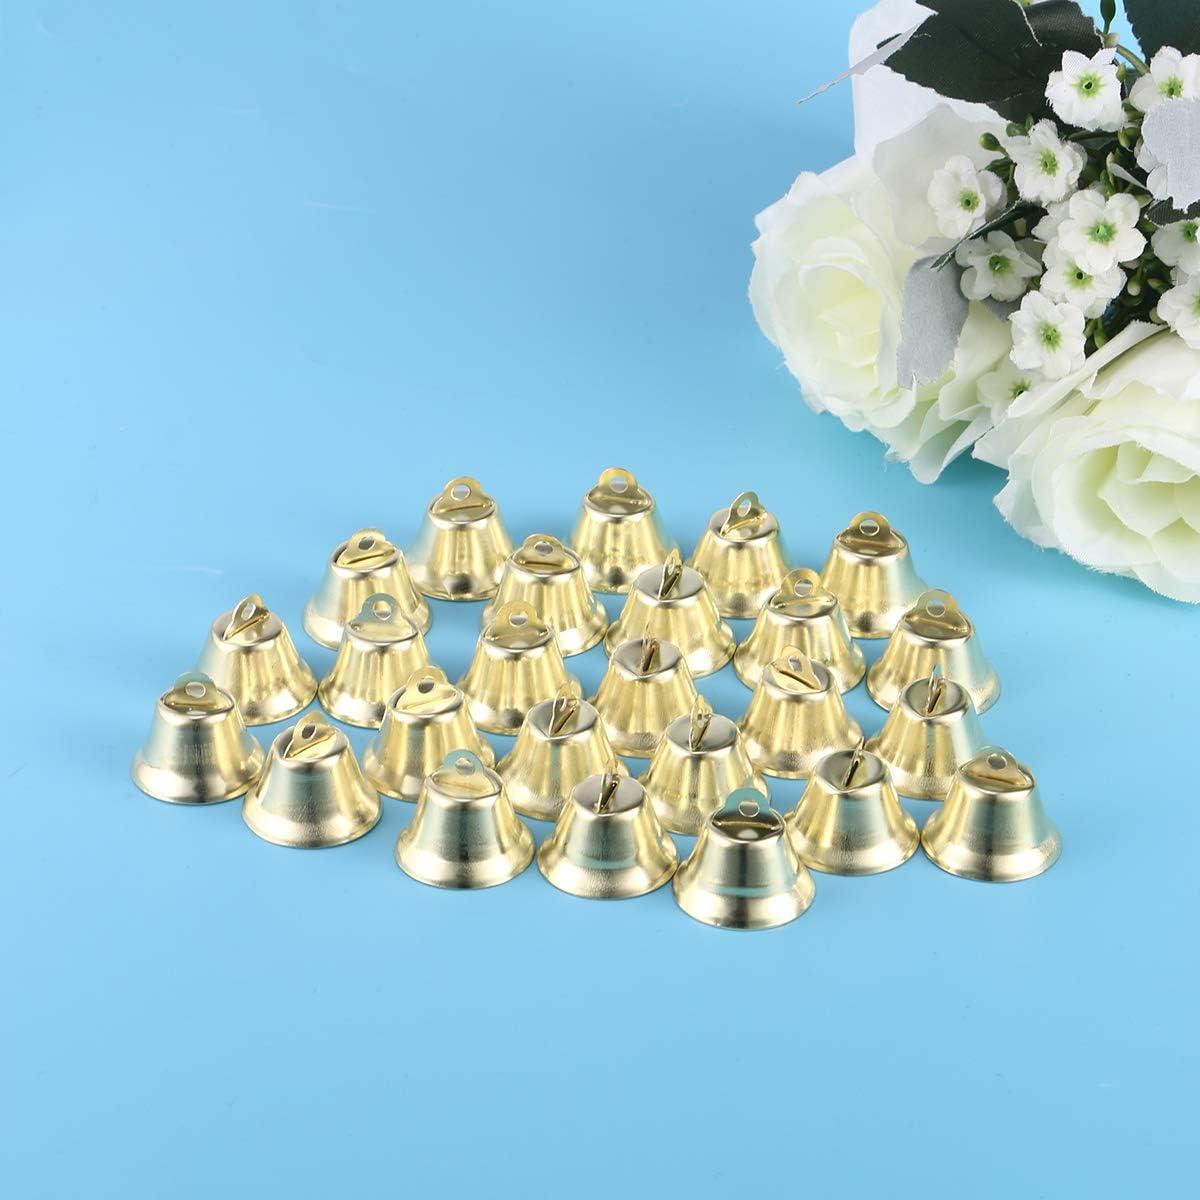 100pcs Gold Metal Liberty Jingle Bells Small Bells Brass Bells for Christmas Festival Decor DIY Craft Golden//26mm